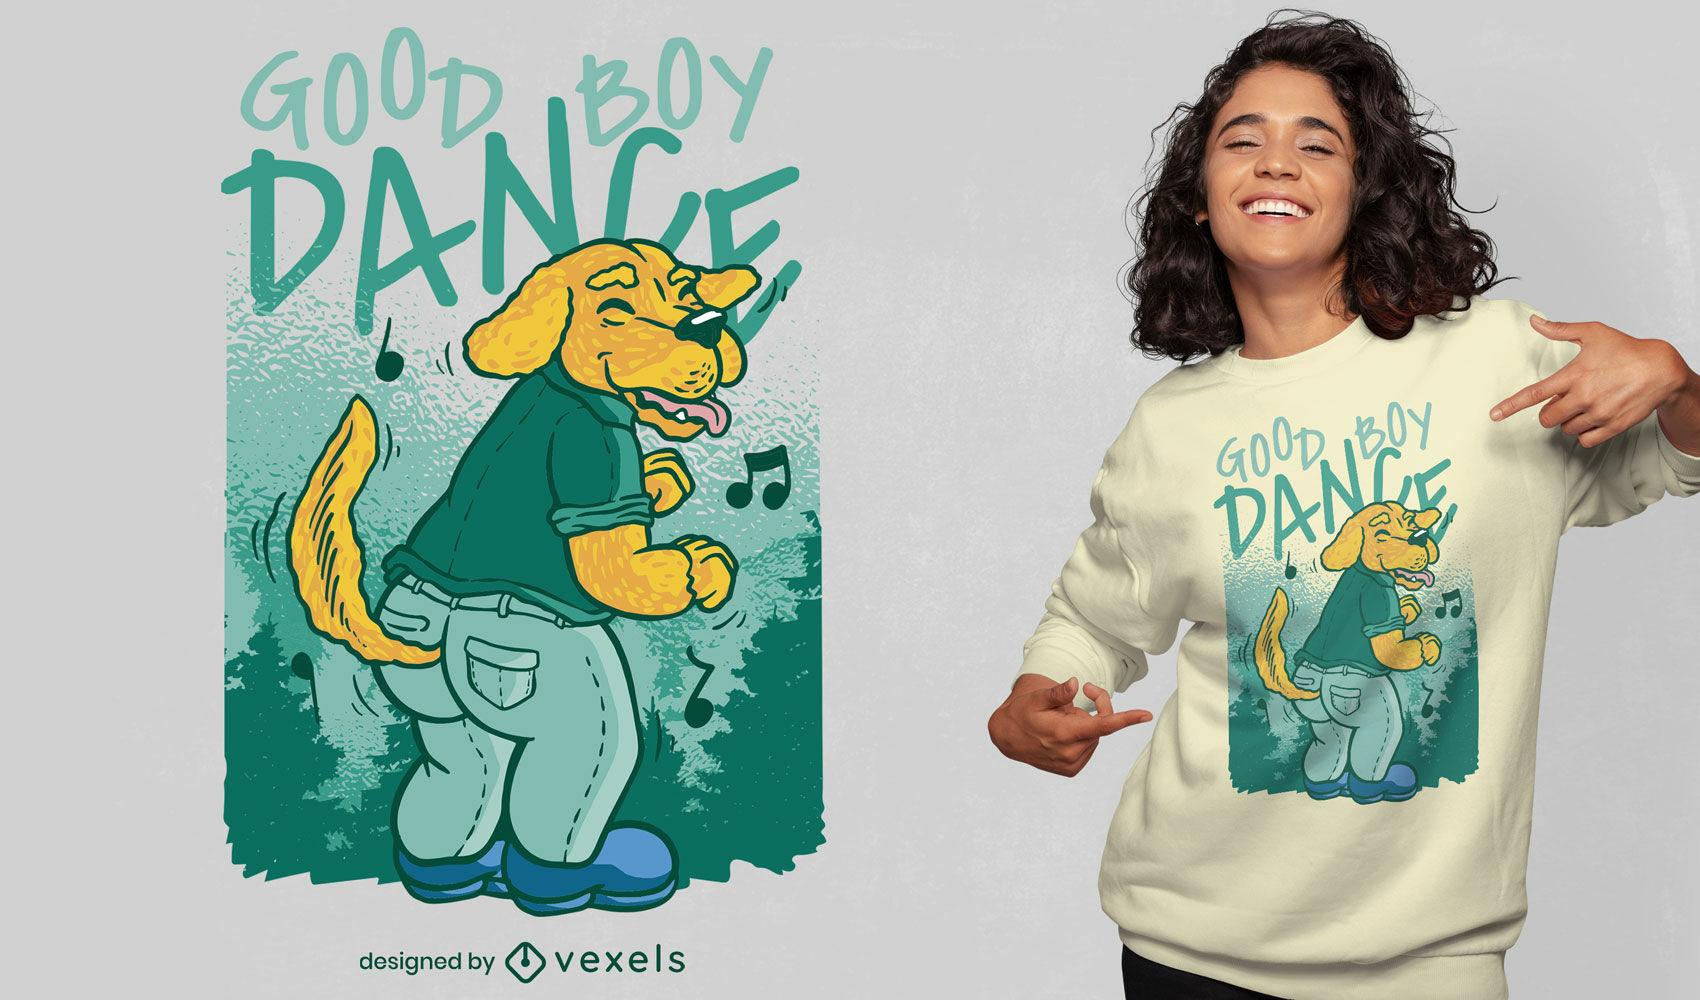 Dise?o de camiseta de dibujos animados de perro bailando